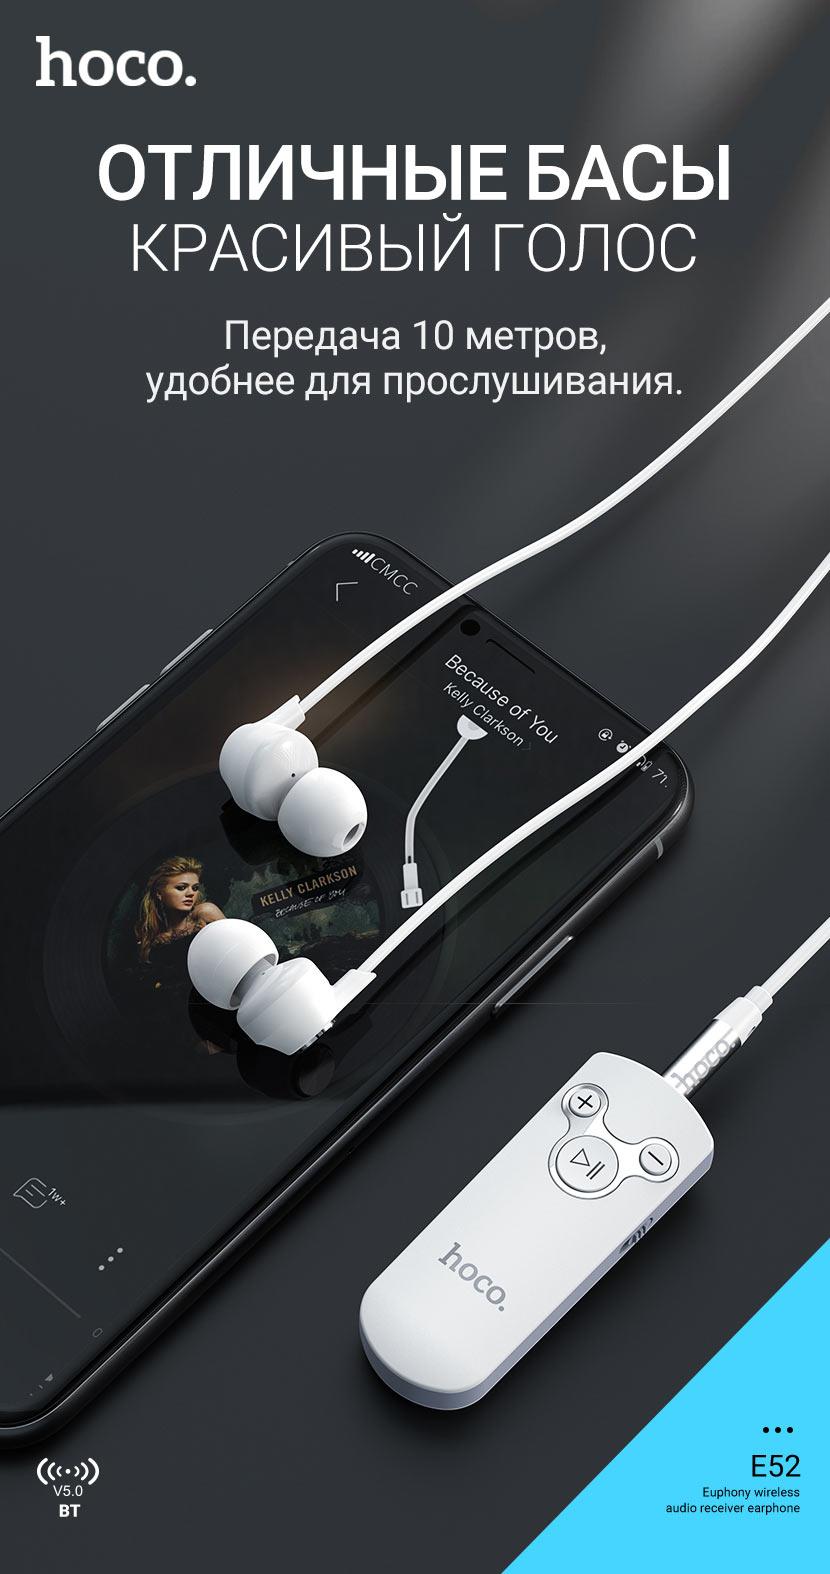 hoco news e52 euphony wireless audio receiver earphones bass ru